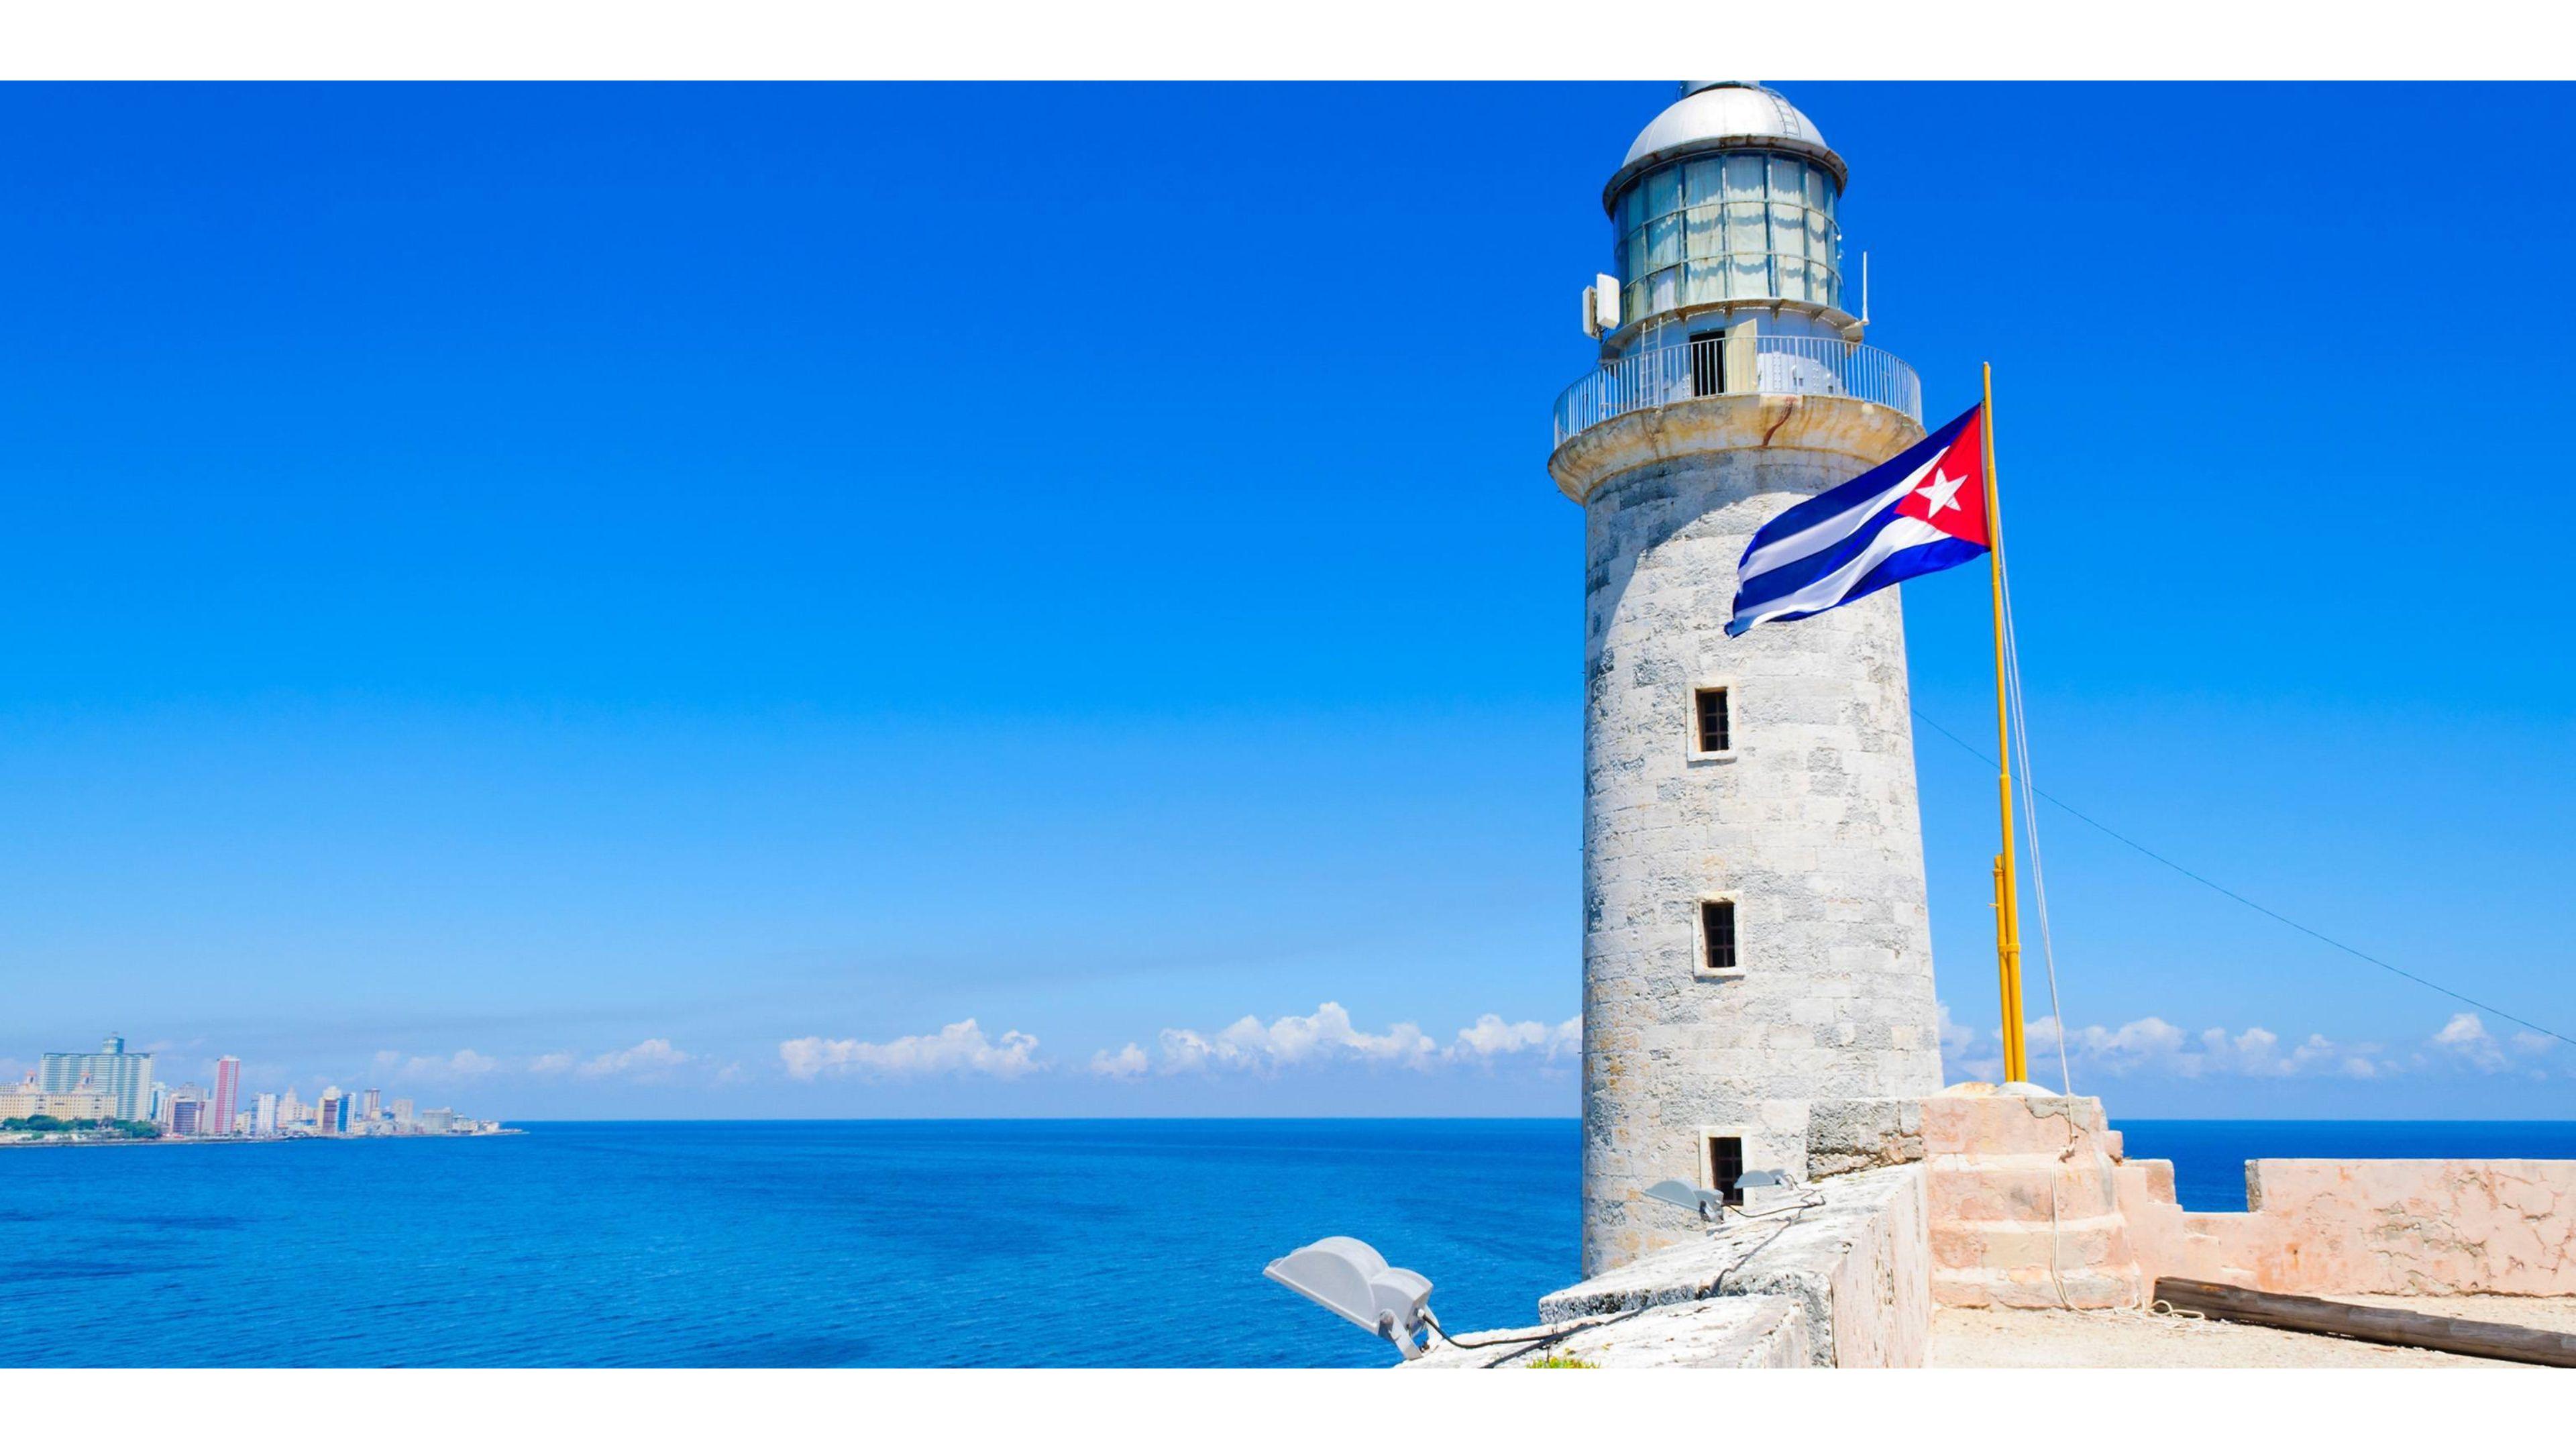 Wallpapers Cuba 79 3840x2160